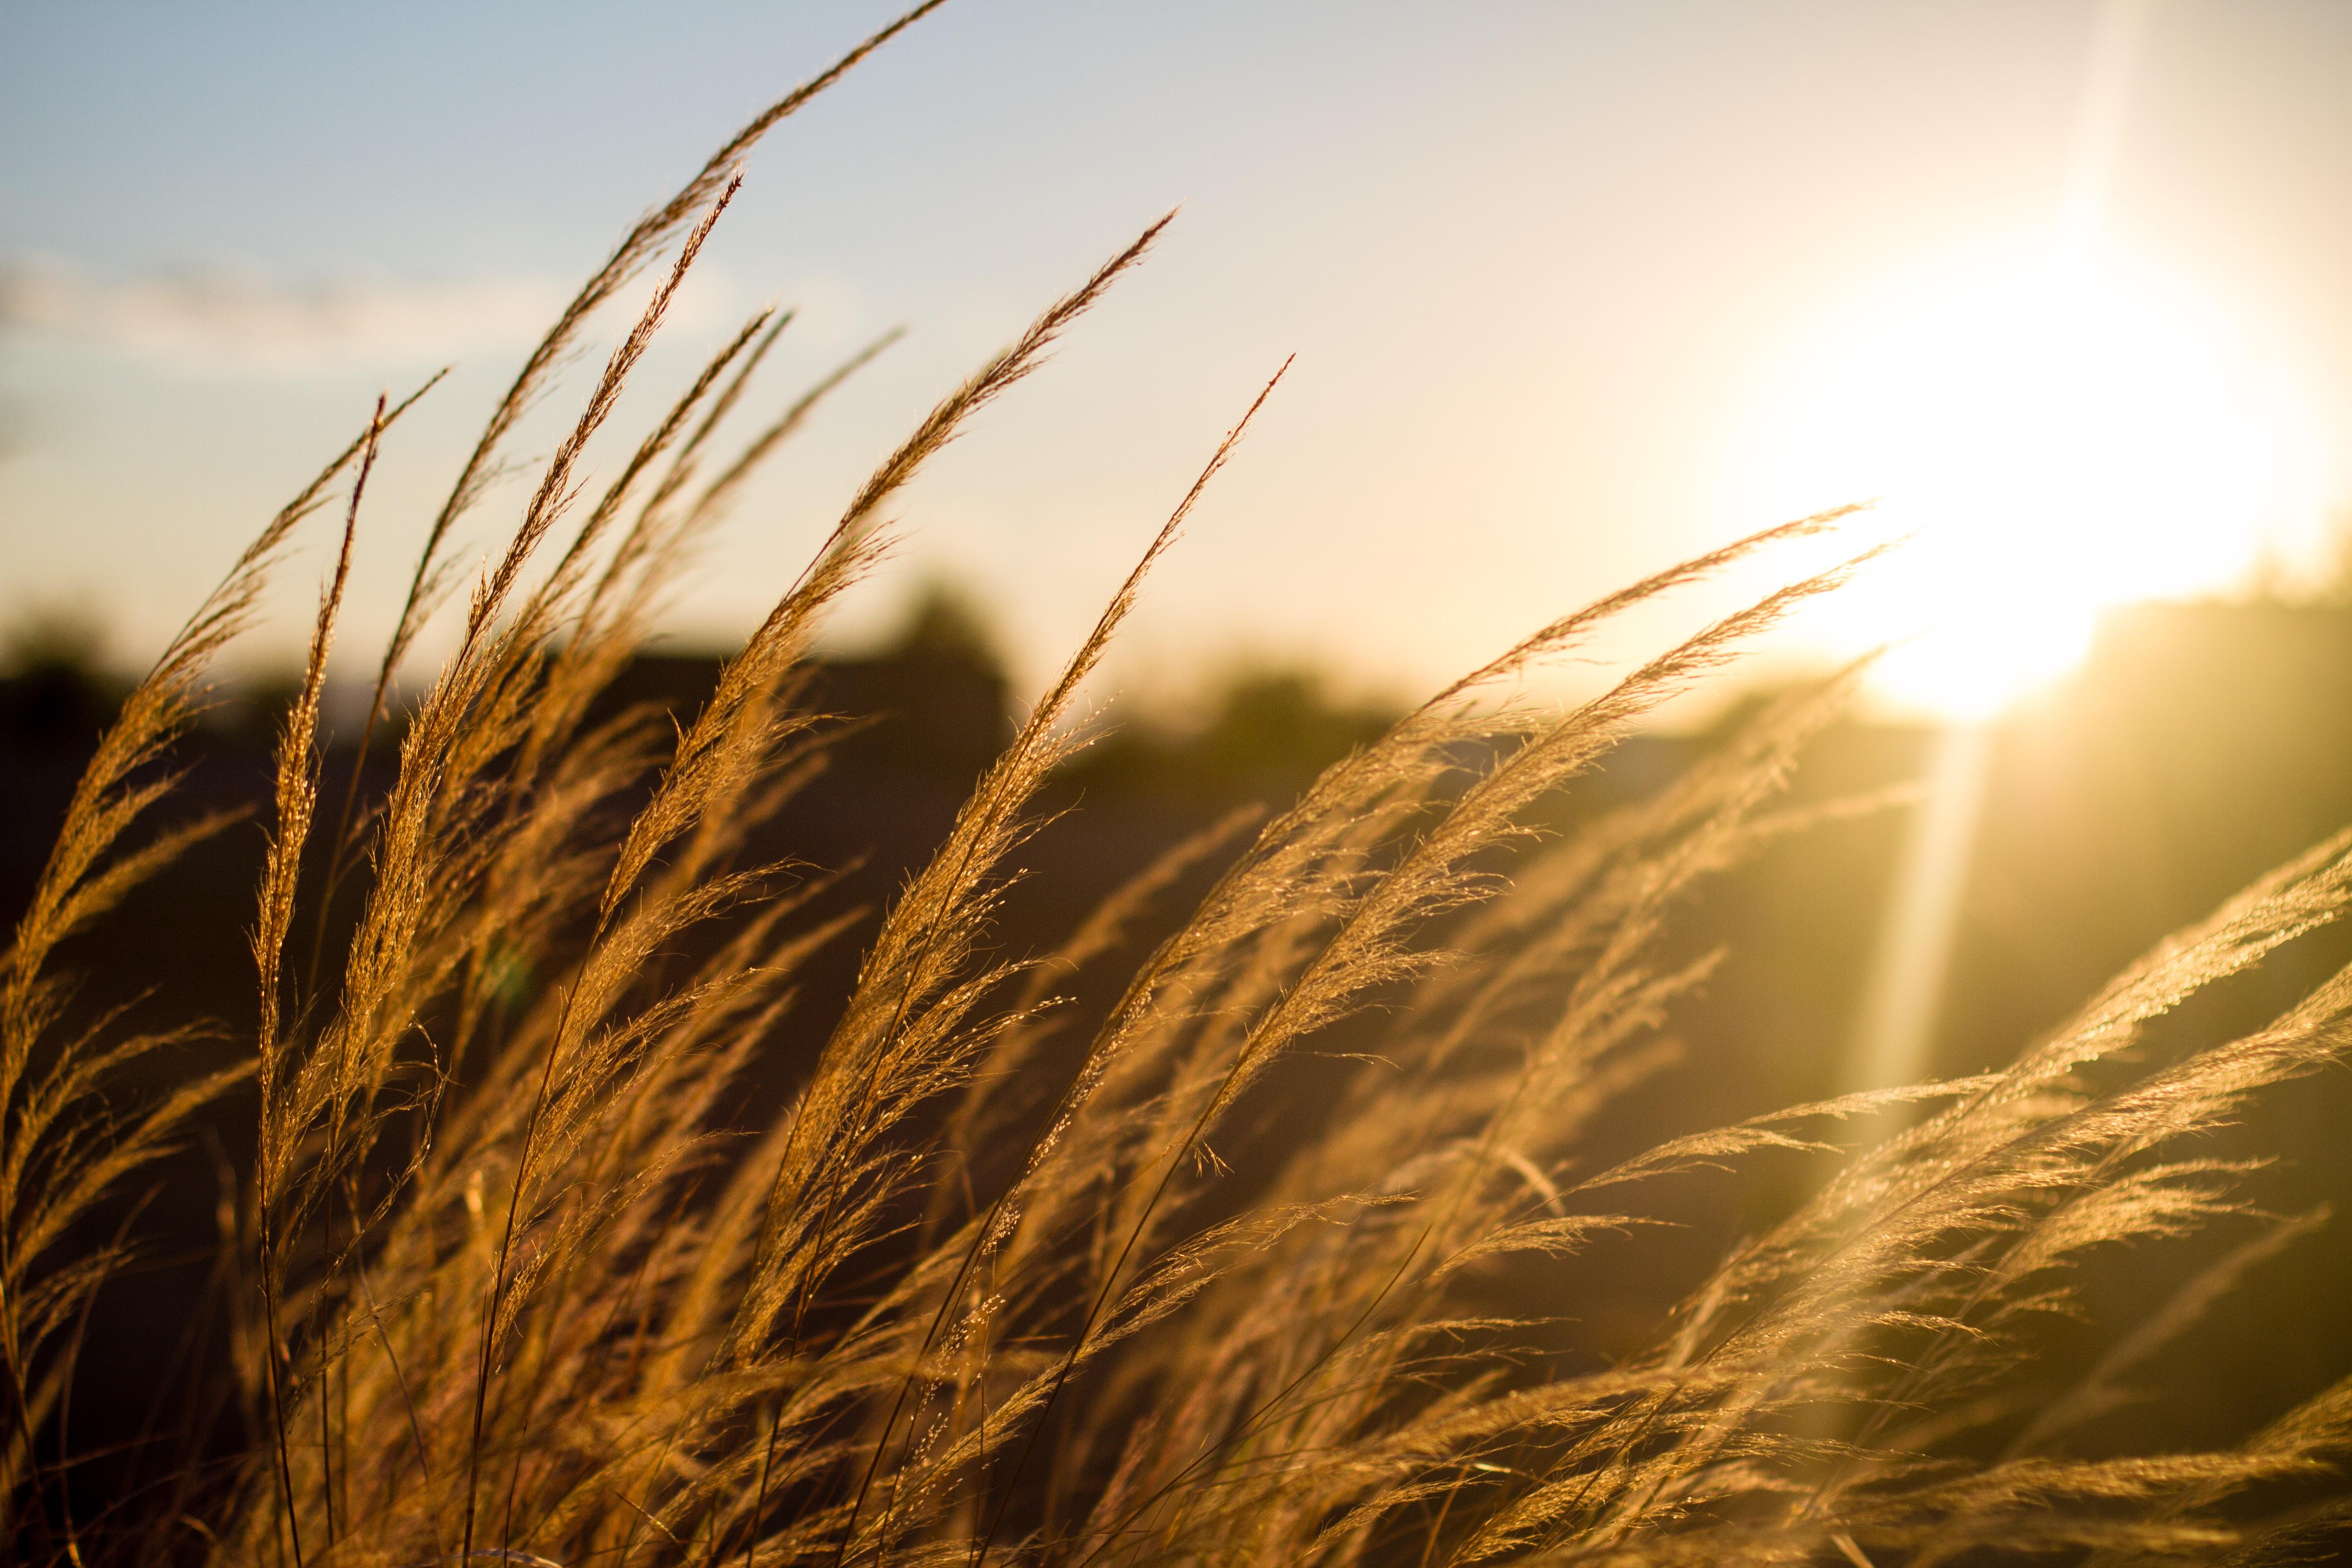 такие картинка рассвет и пшеница футляра выходе газопровода